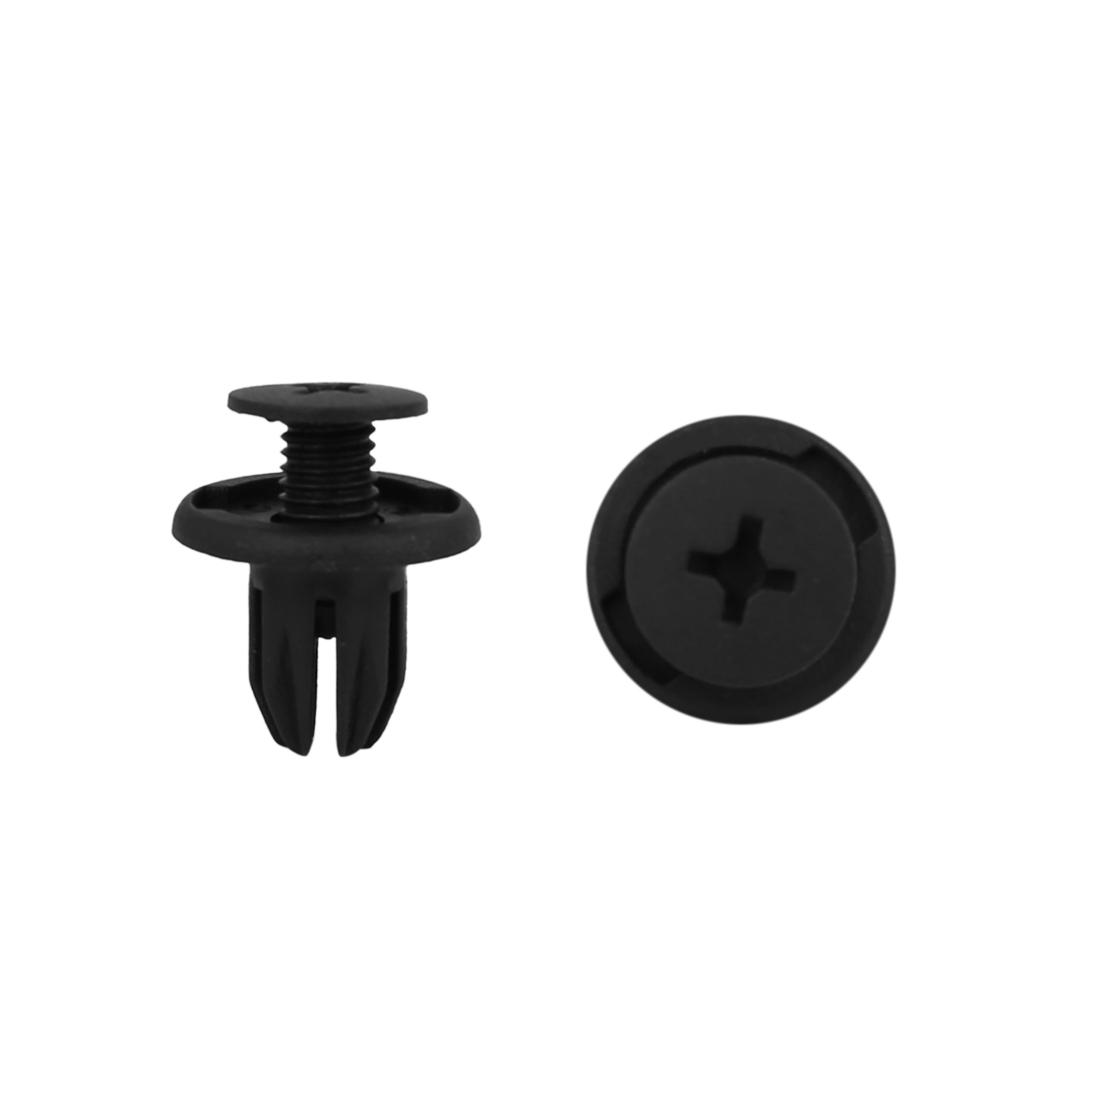 17Pcs 10mm Black Plastic Rivets Push Type Panel Retainer Fastener Clip for Car